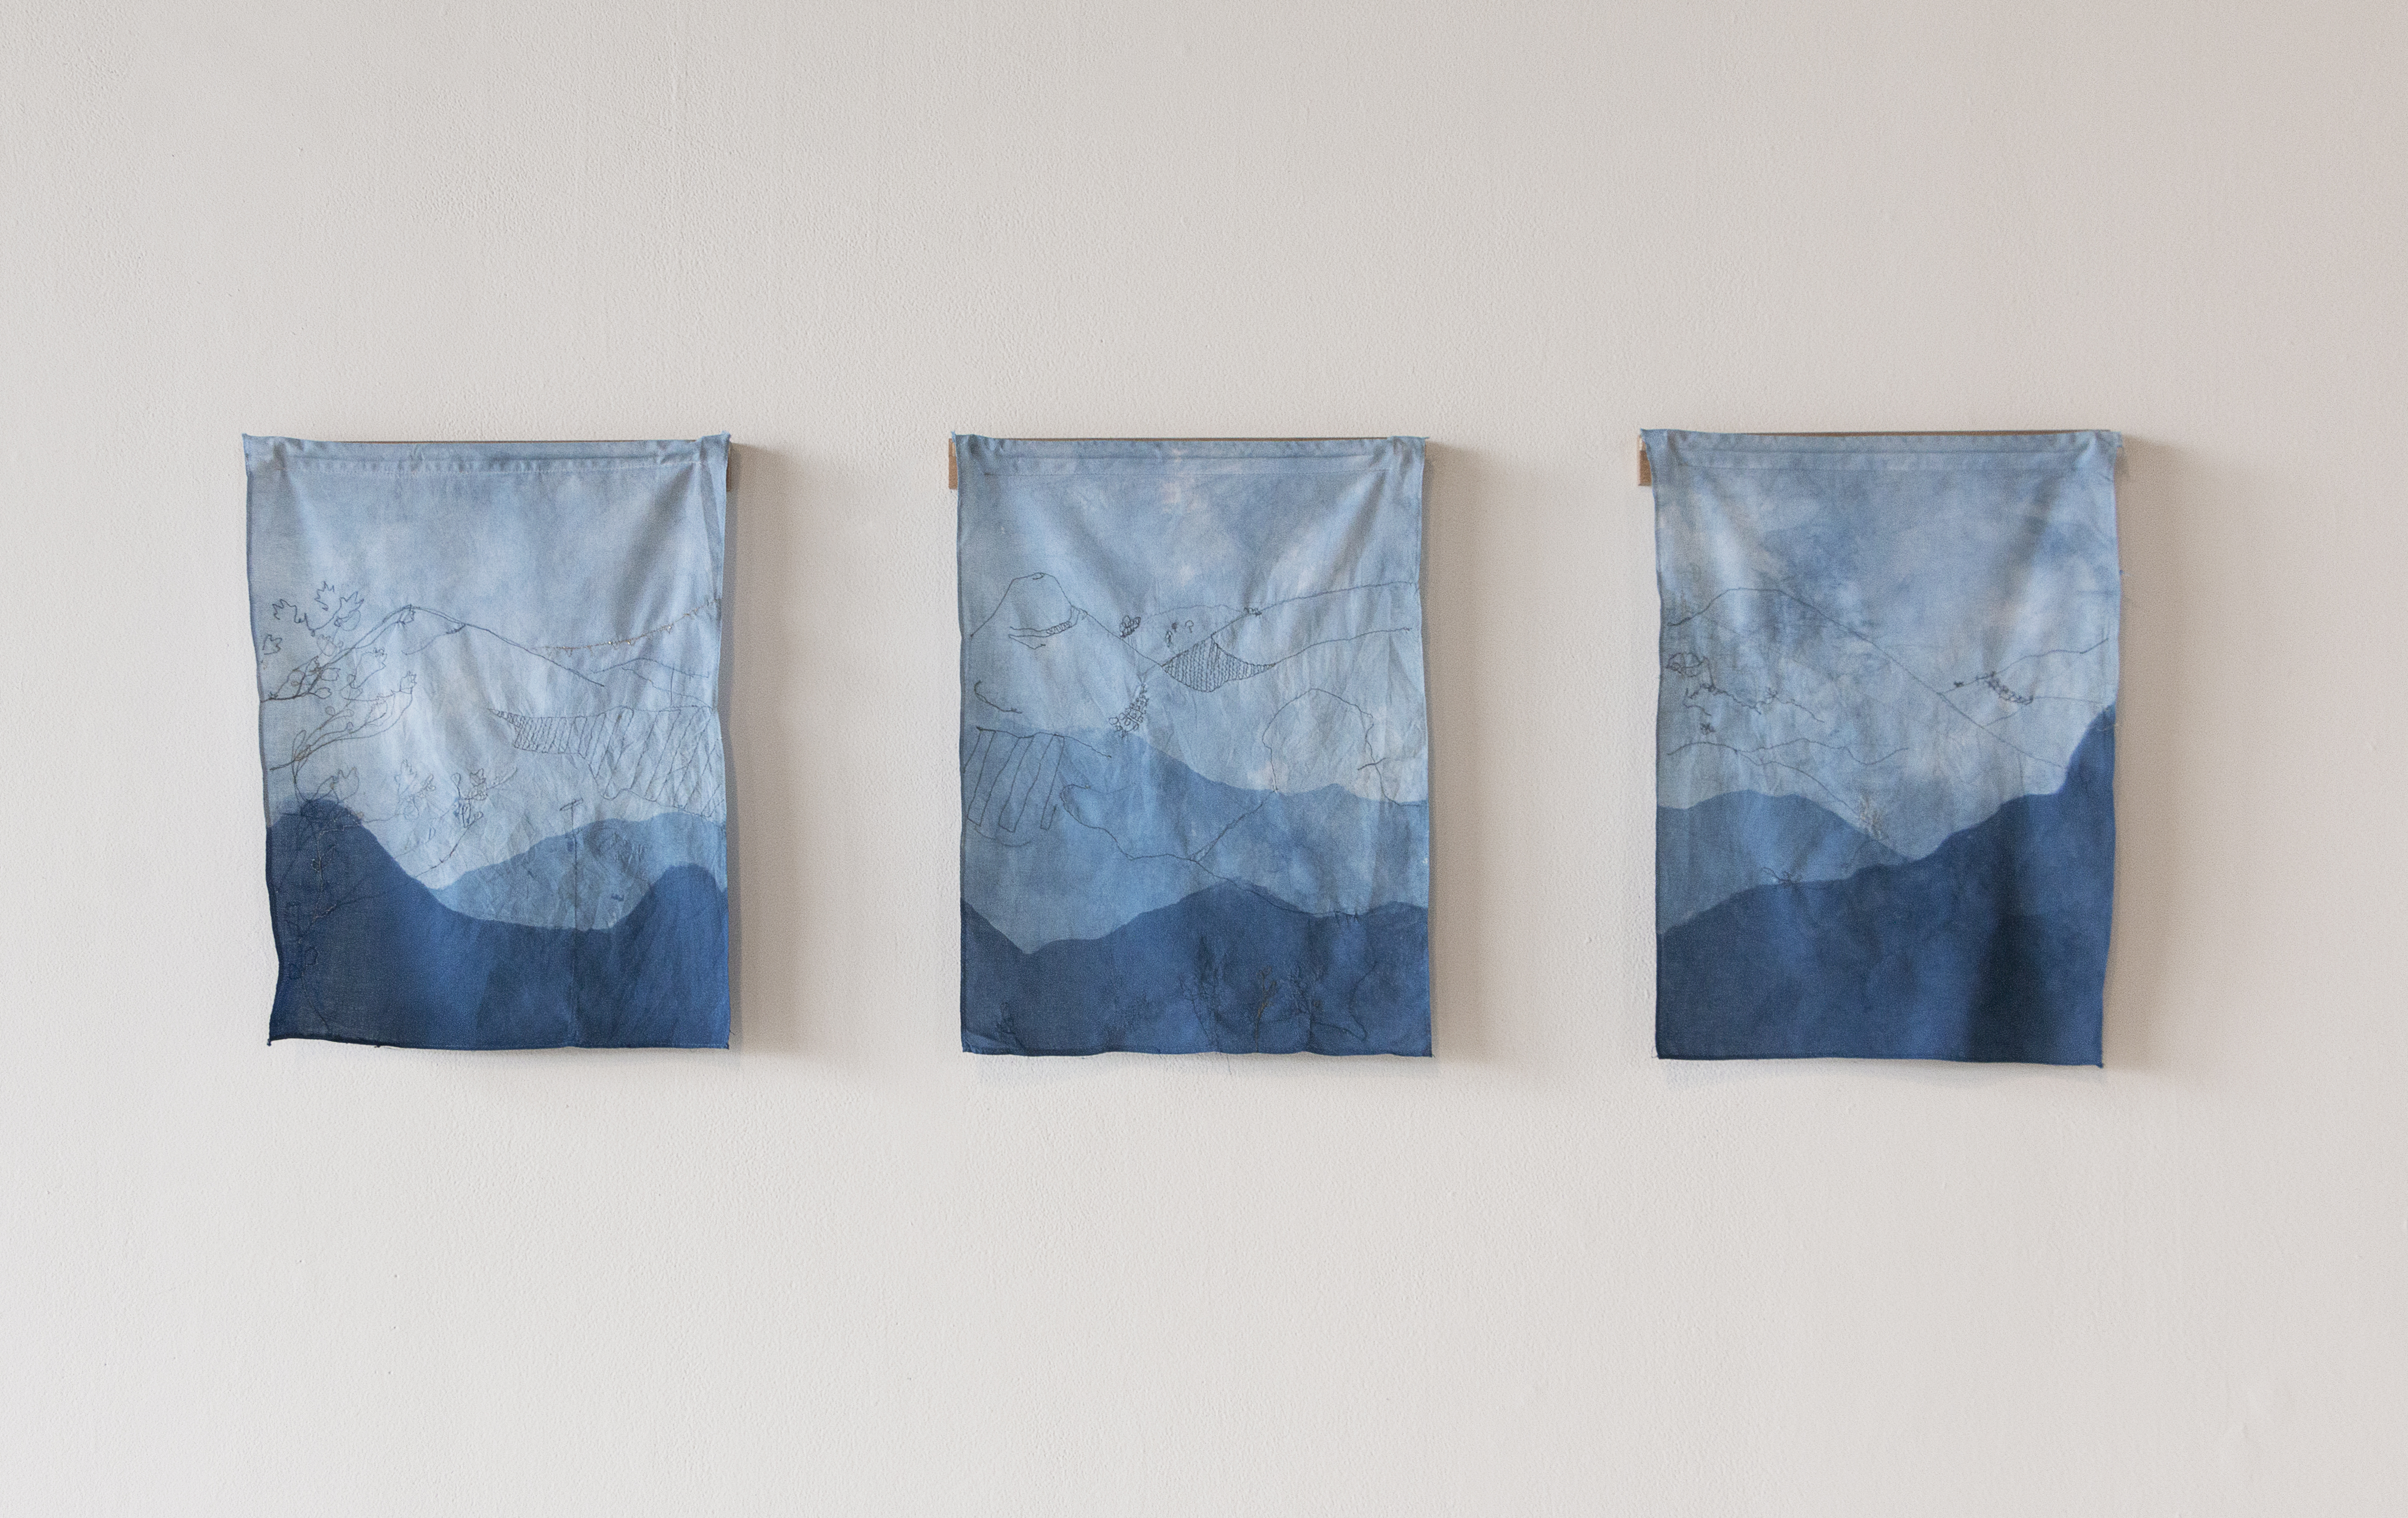 Estamos Sin Fronteras: Mary Kuvet in Bricolaje